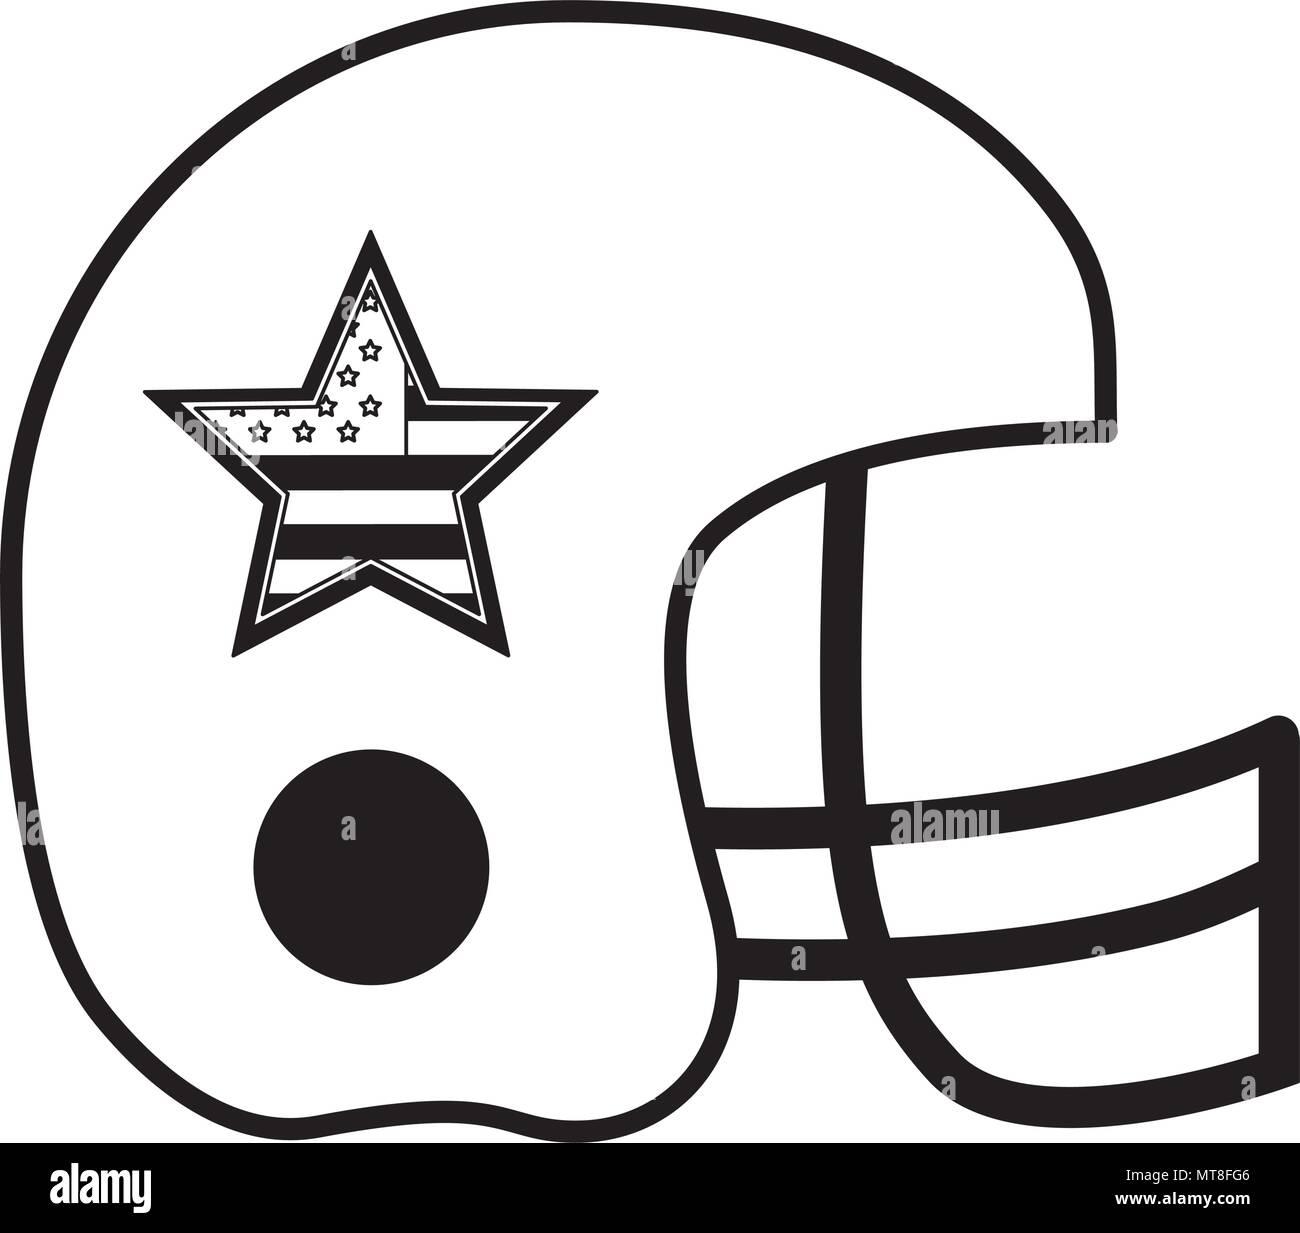 american football helmet with usa flag